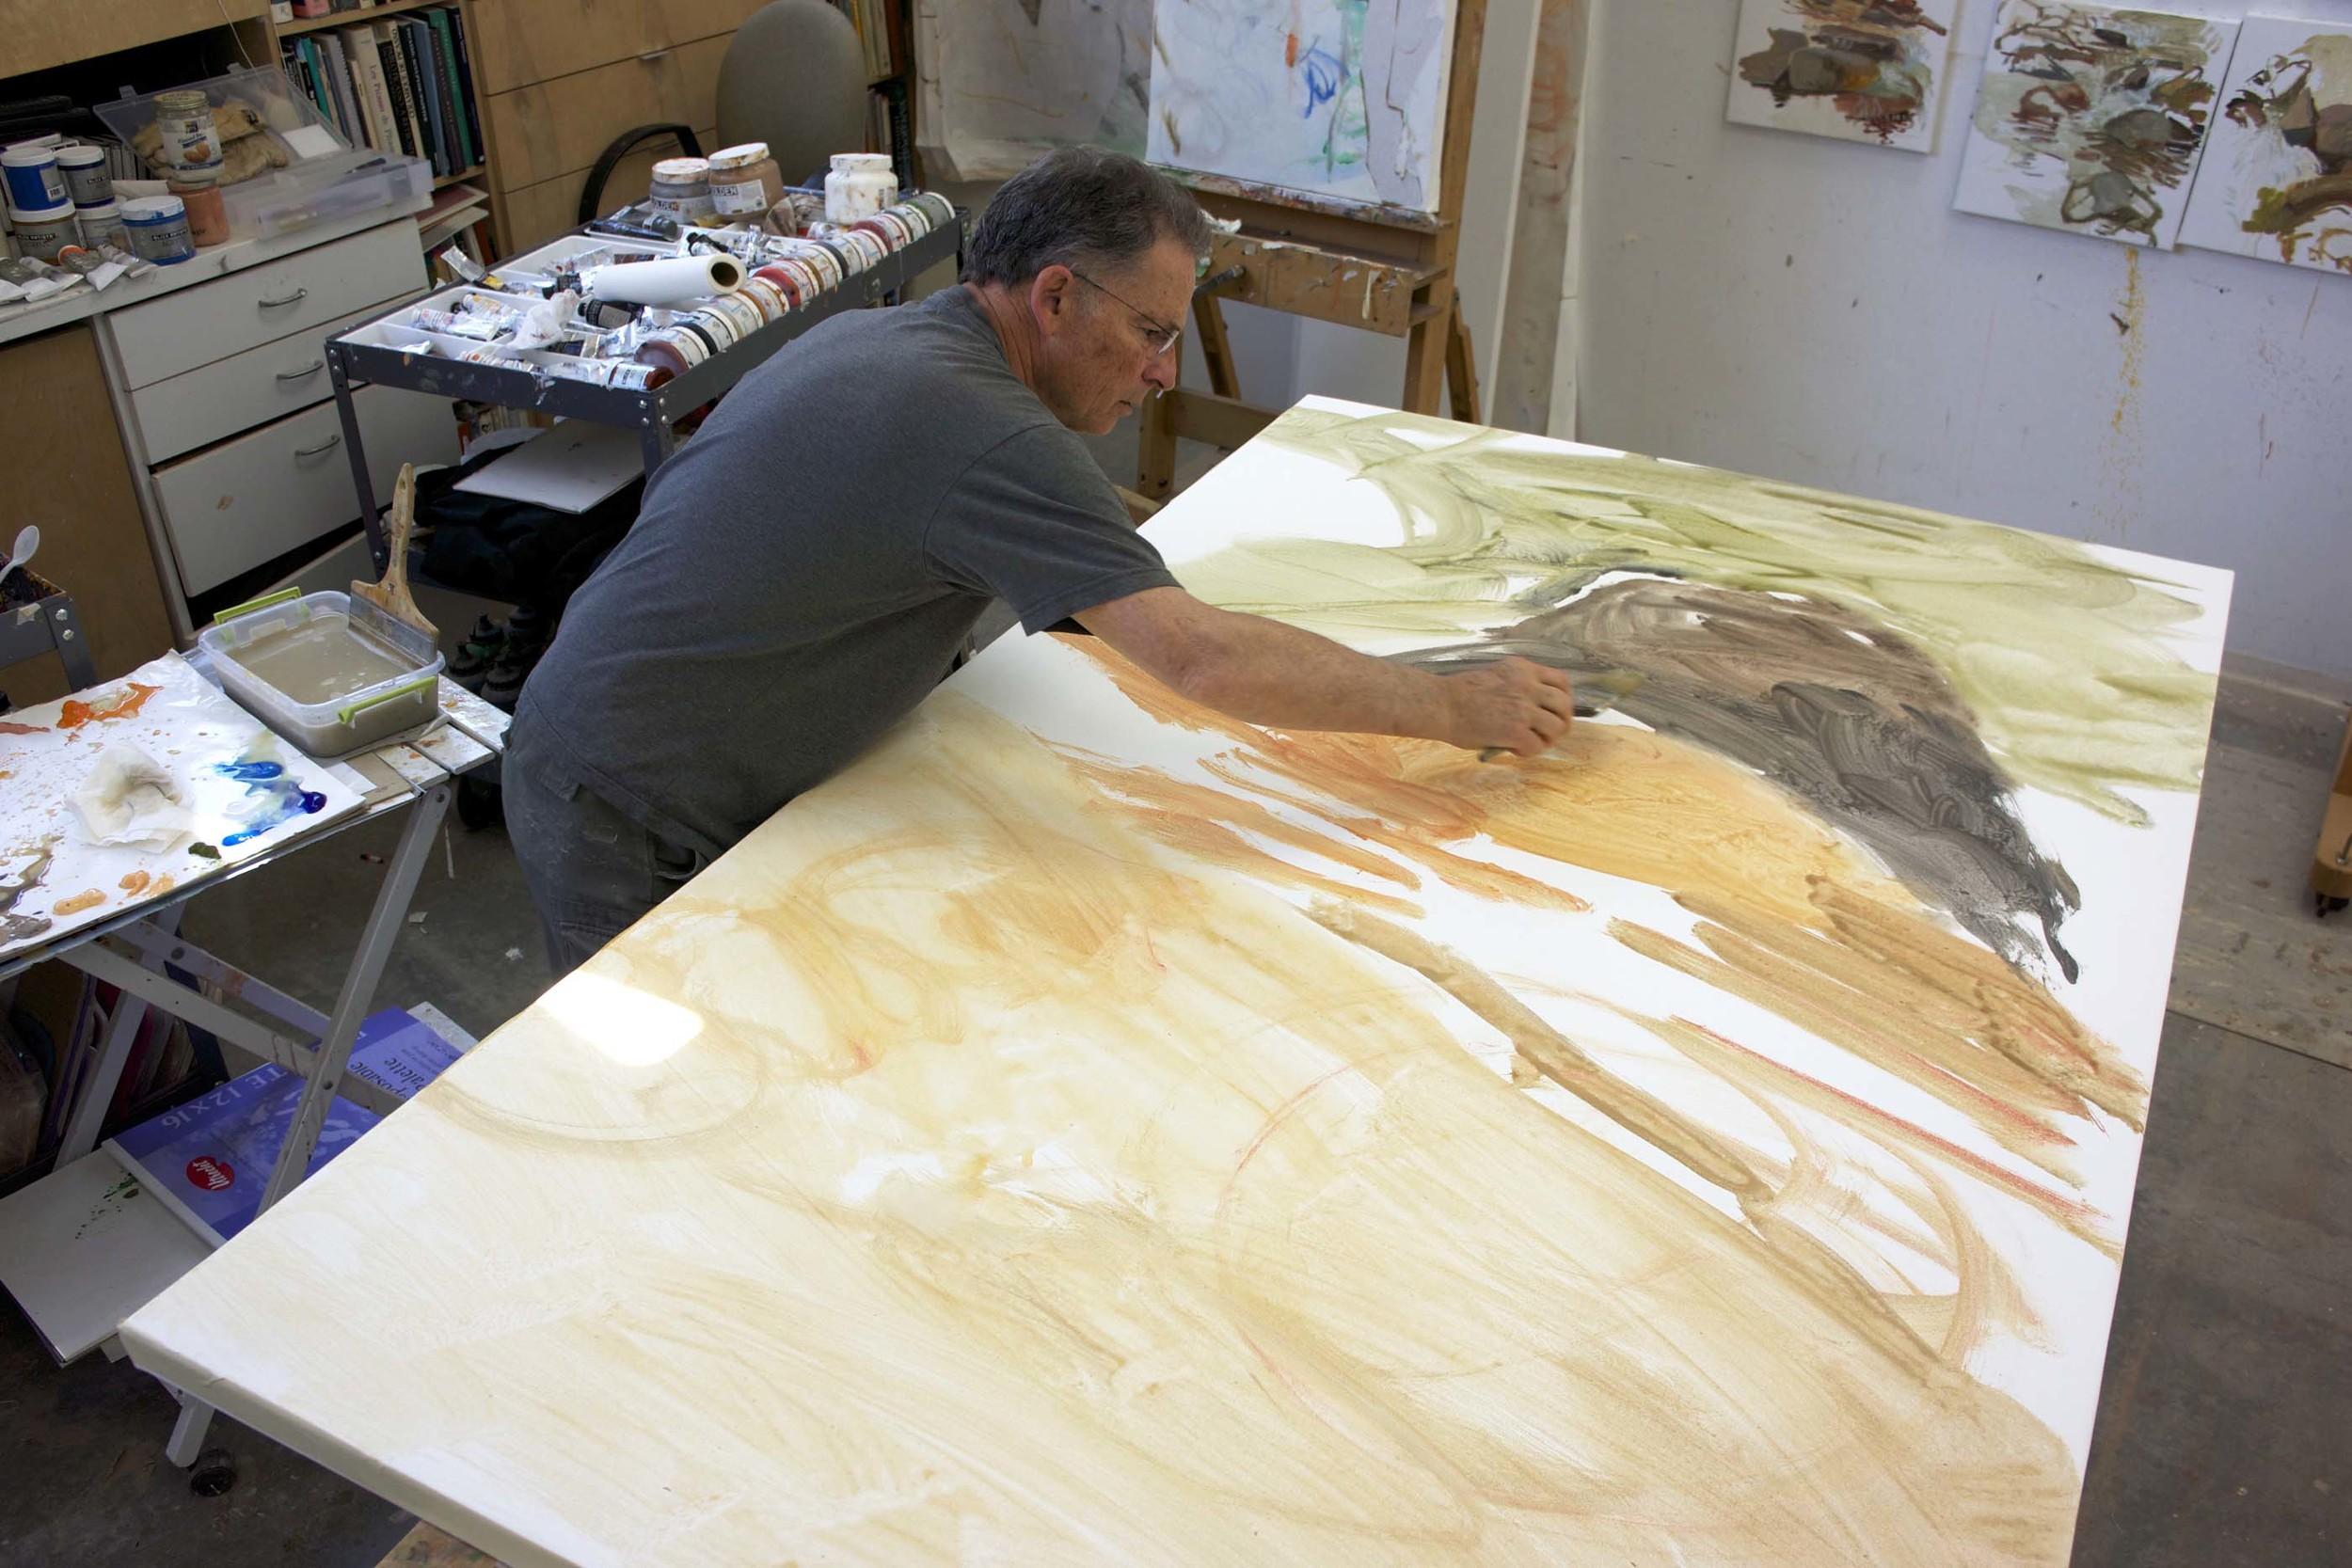 site-8.15.13 RAW-pt paints kai creek 78x48.jpg